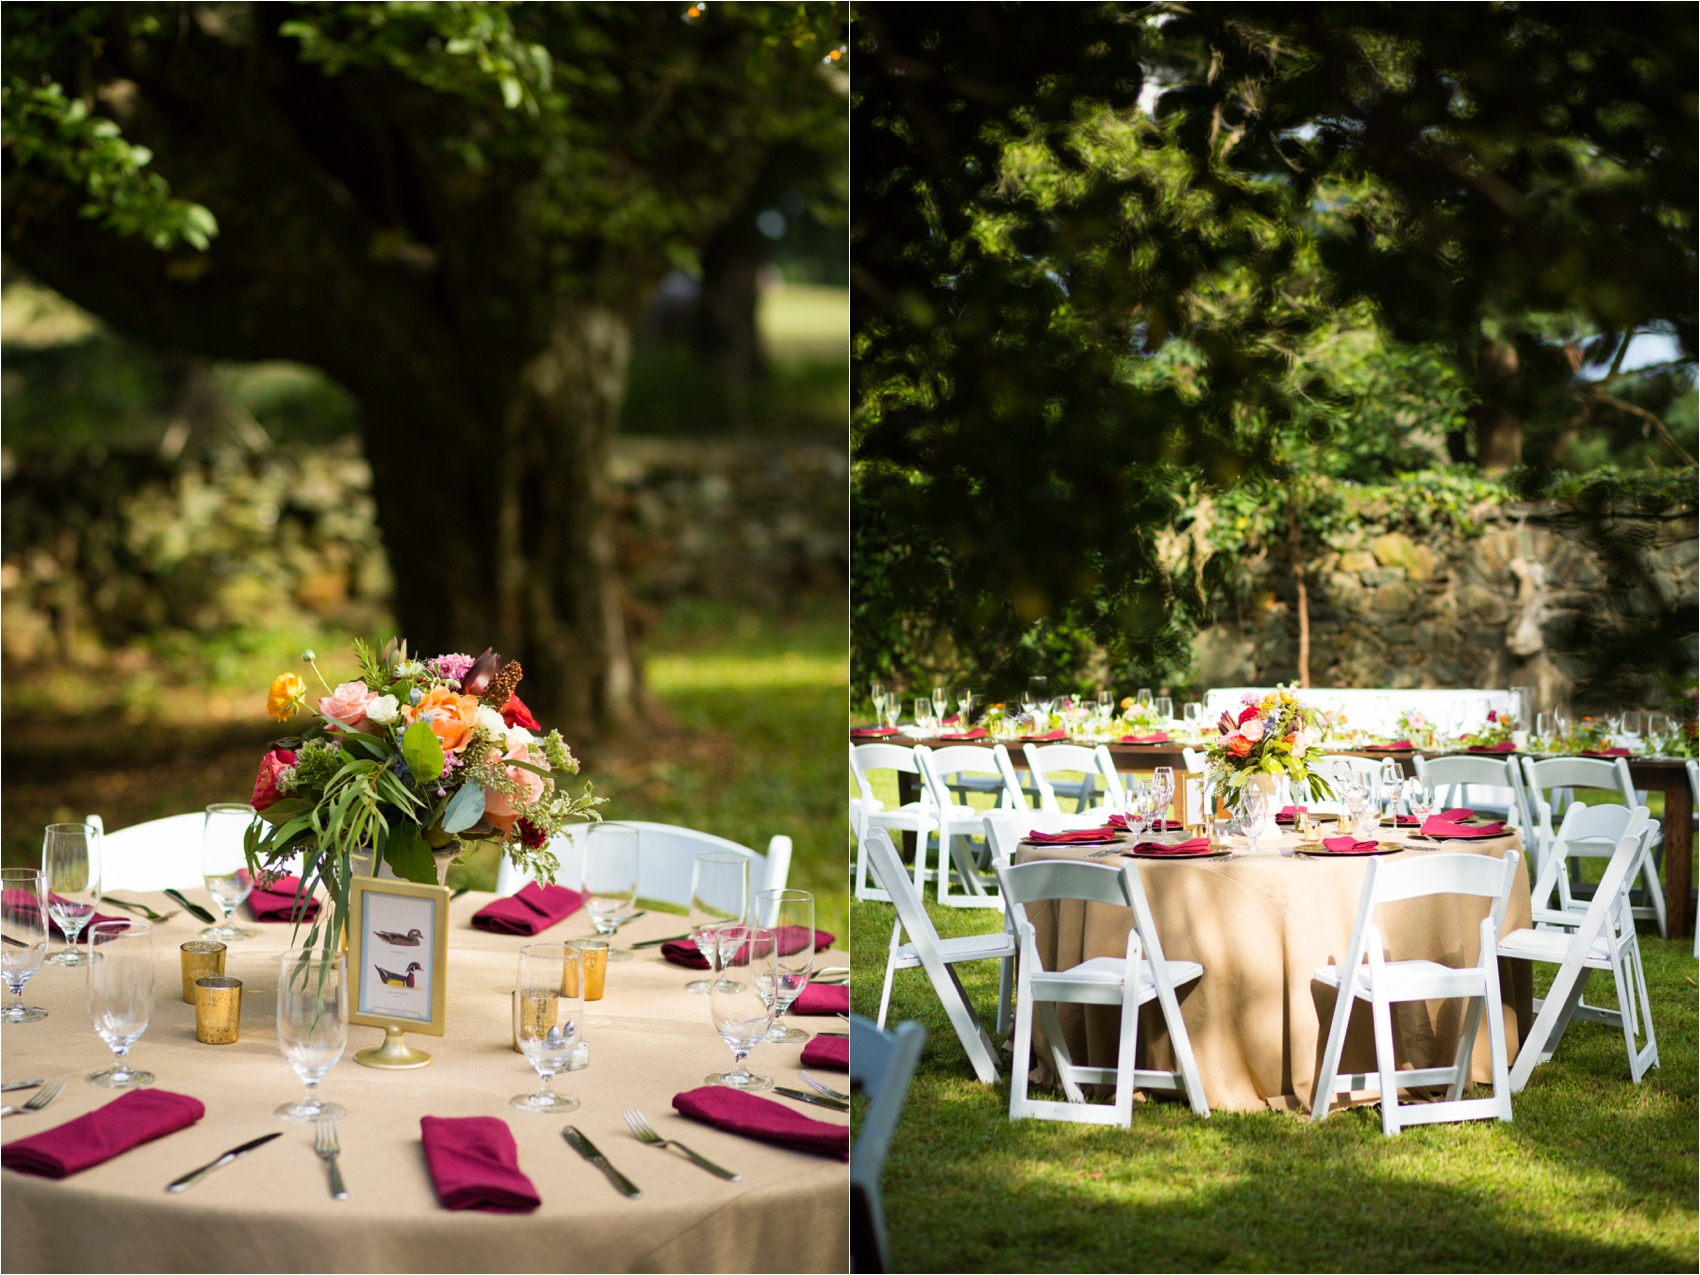 Feather-and-Oak-Rainforest-Trust-Virginia-Wedding-0350.jpg